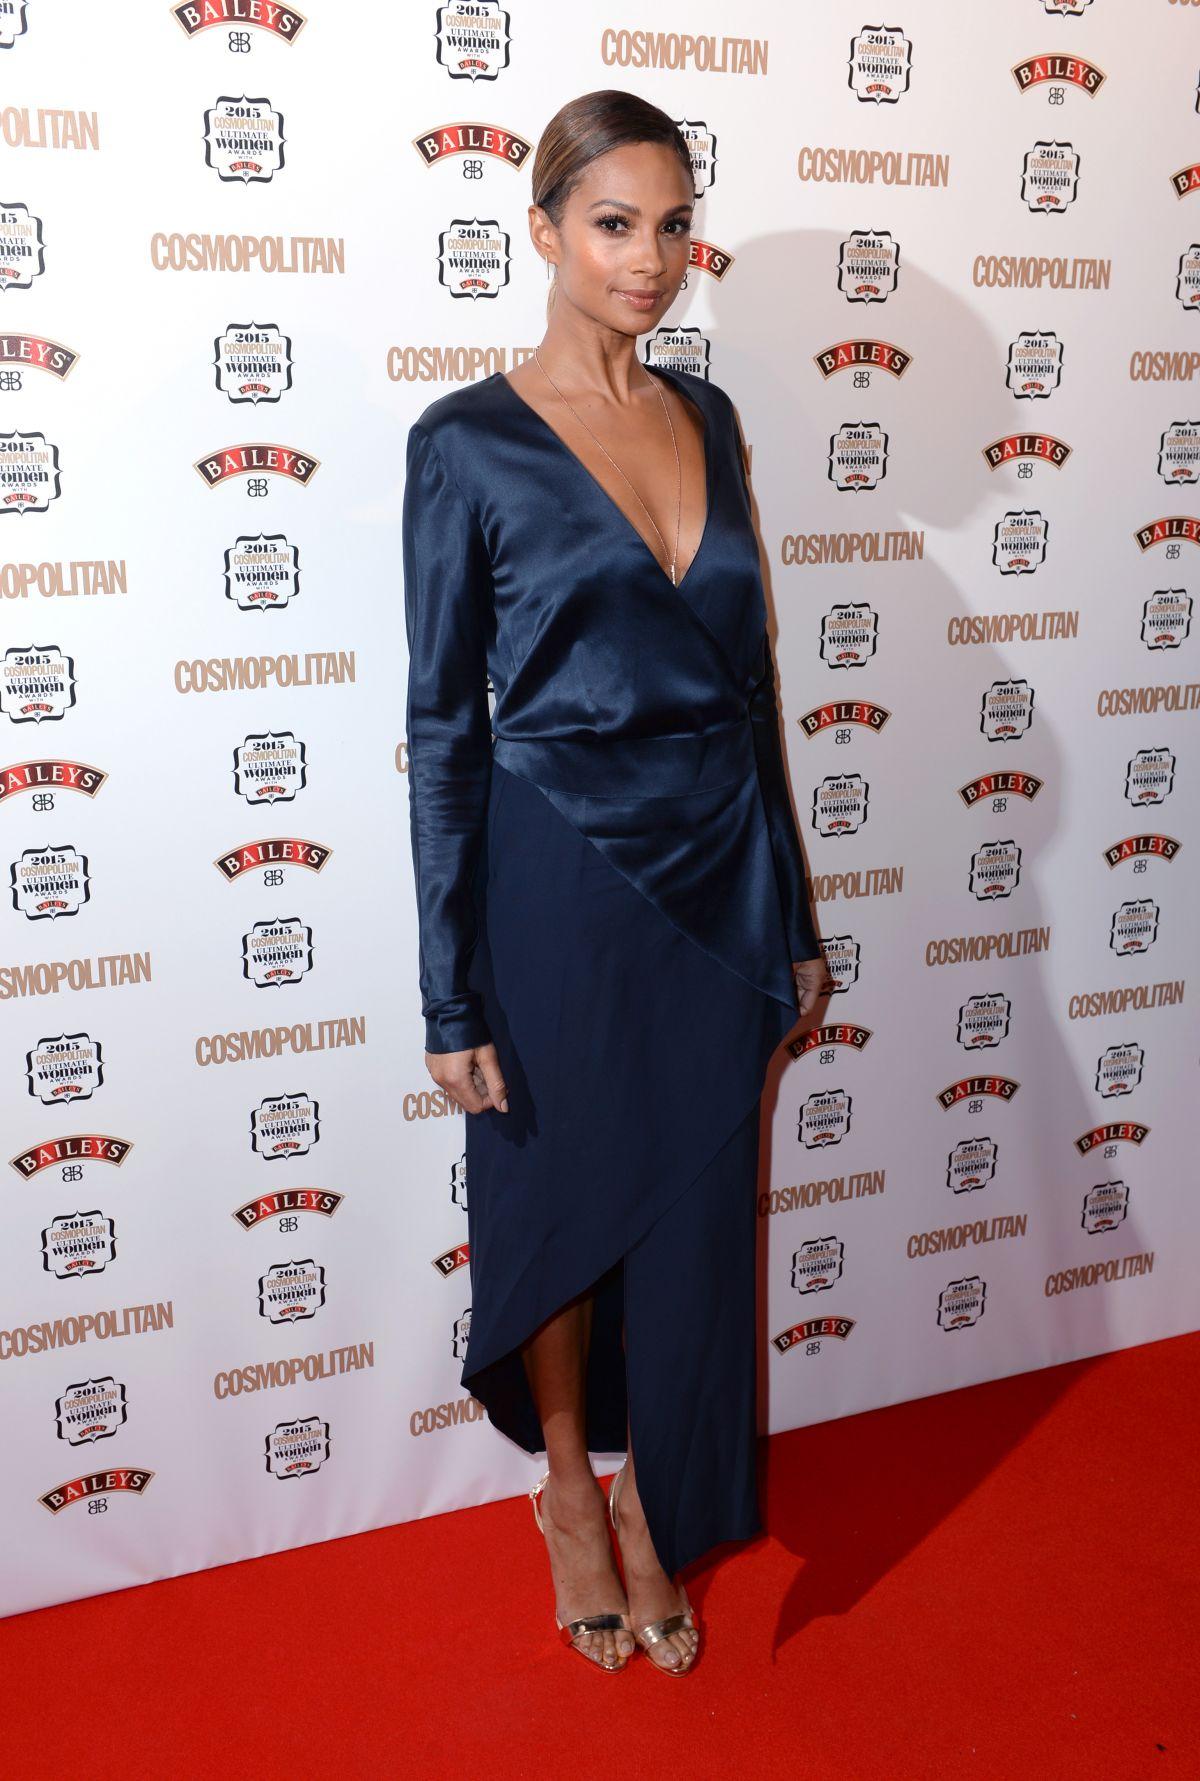 Alesha dixon pictures cosmopolitan ultimate women of the year awards - Alesha Dixon At Cosmopolitan Ultimate Women Of The Year Awards In London 12 03